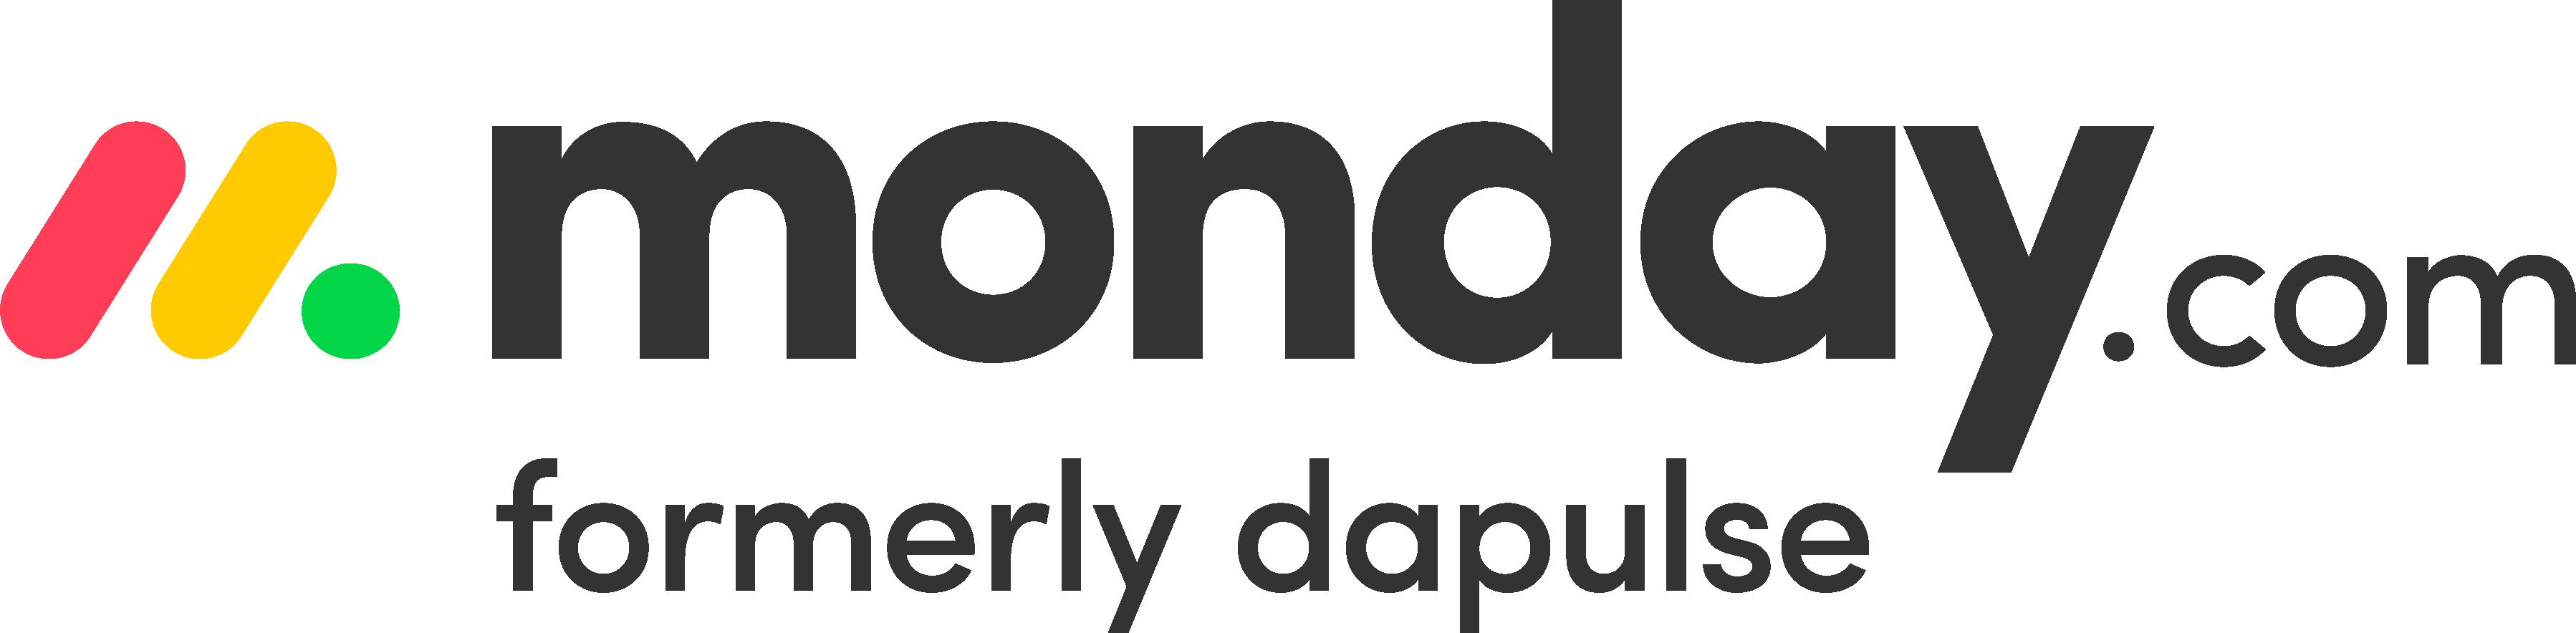 File:Monday.com Logo.png.